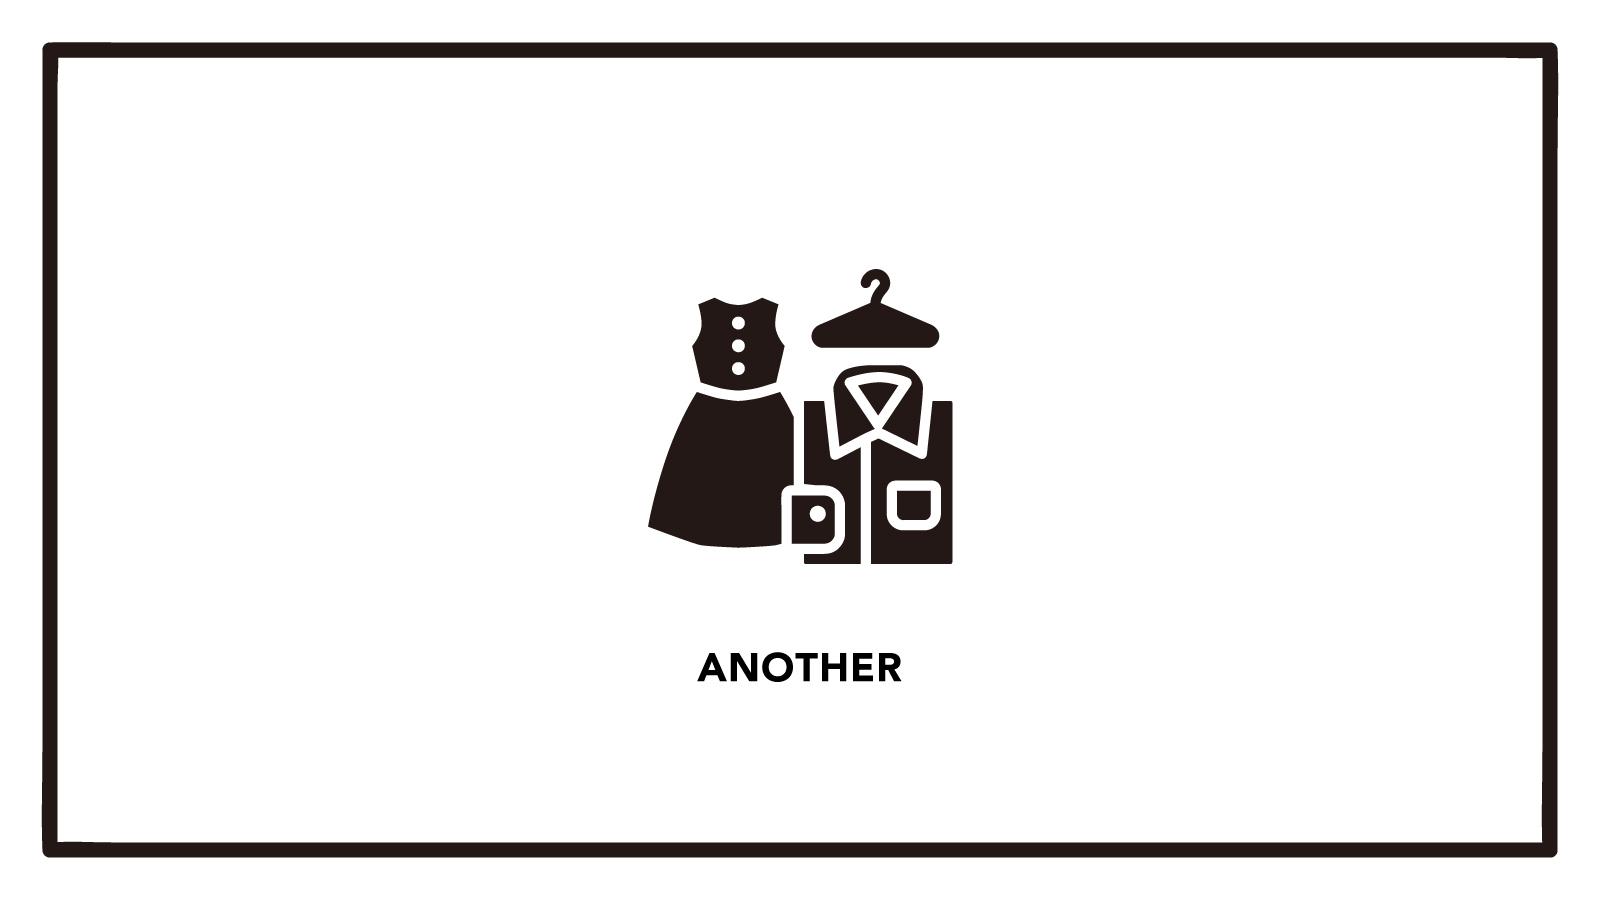 【Webデザイナー】大手企業のオフィシャルサイト担当を募集!のカバー写真